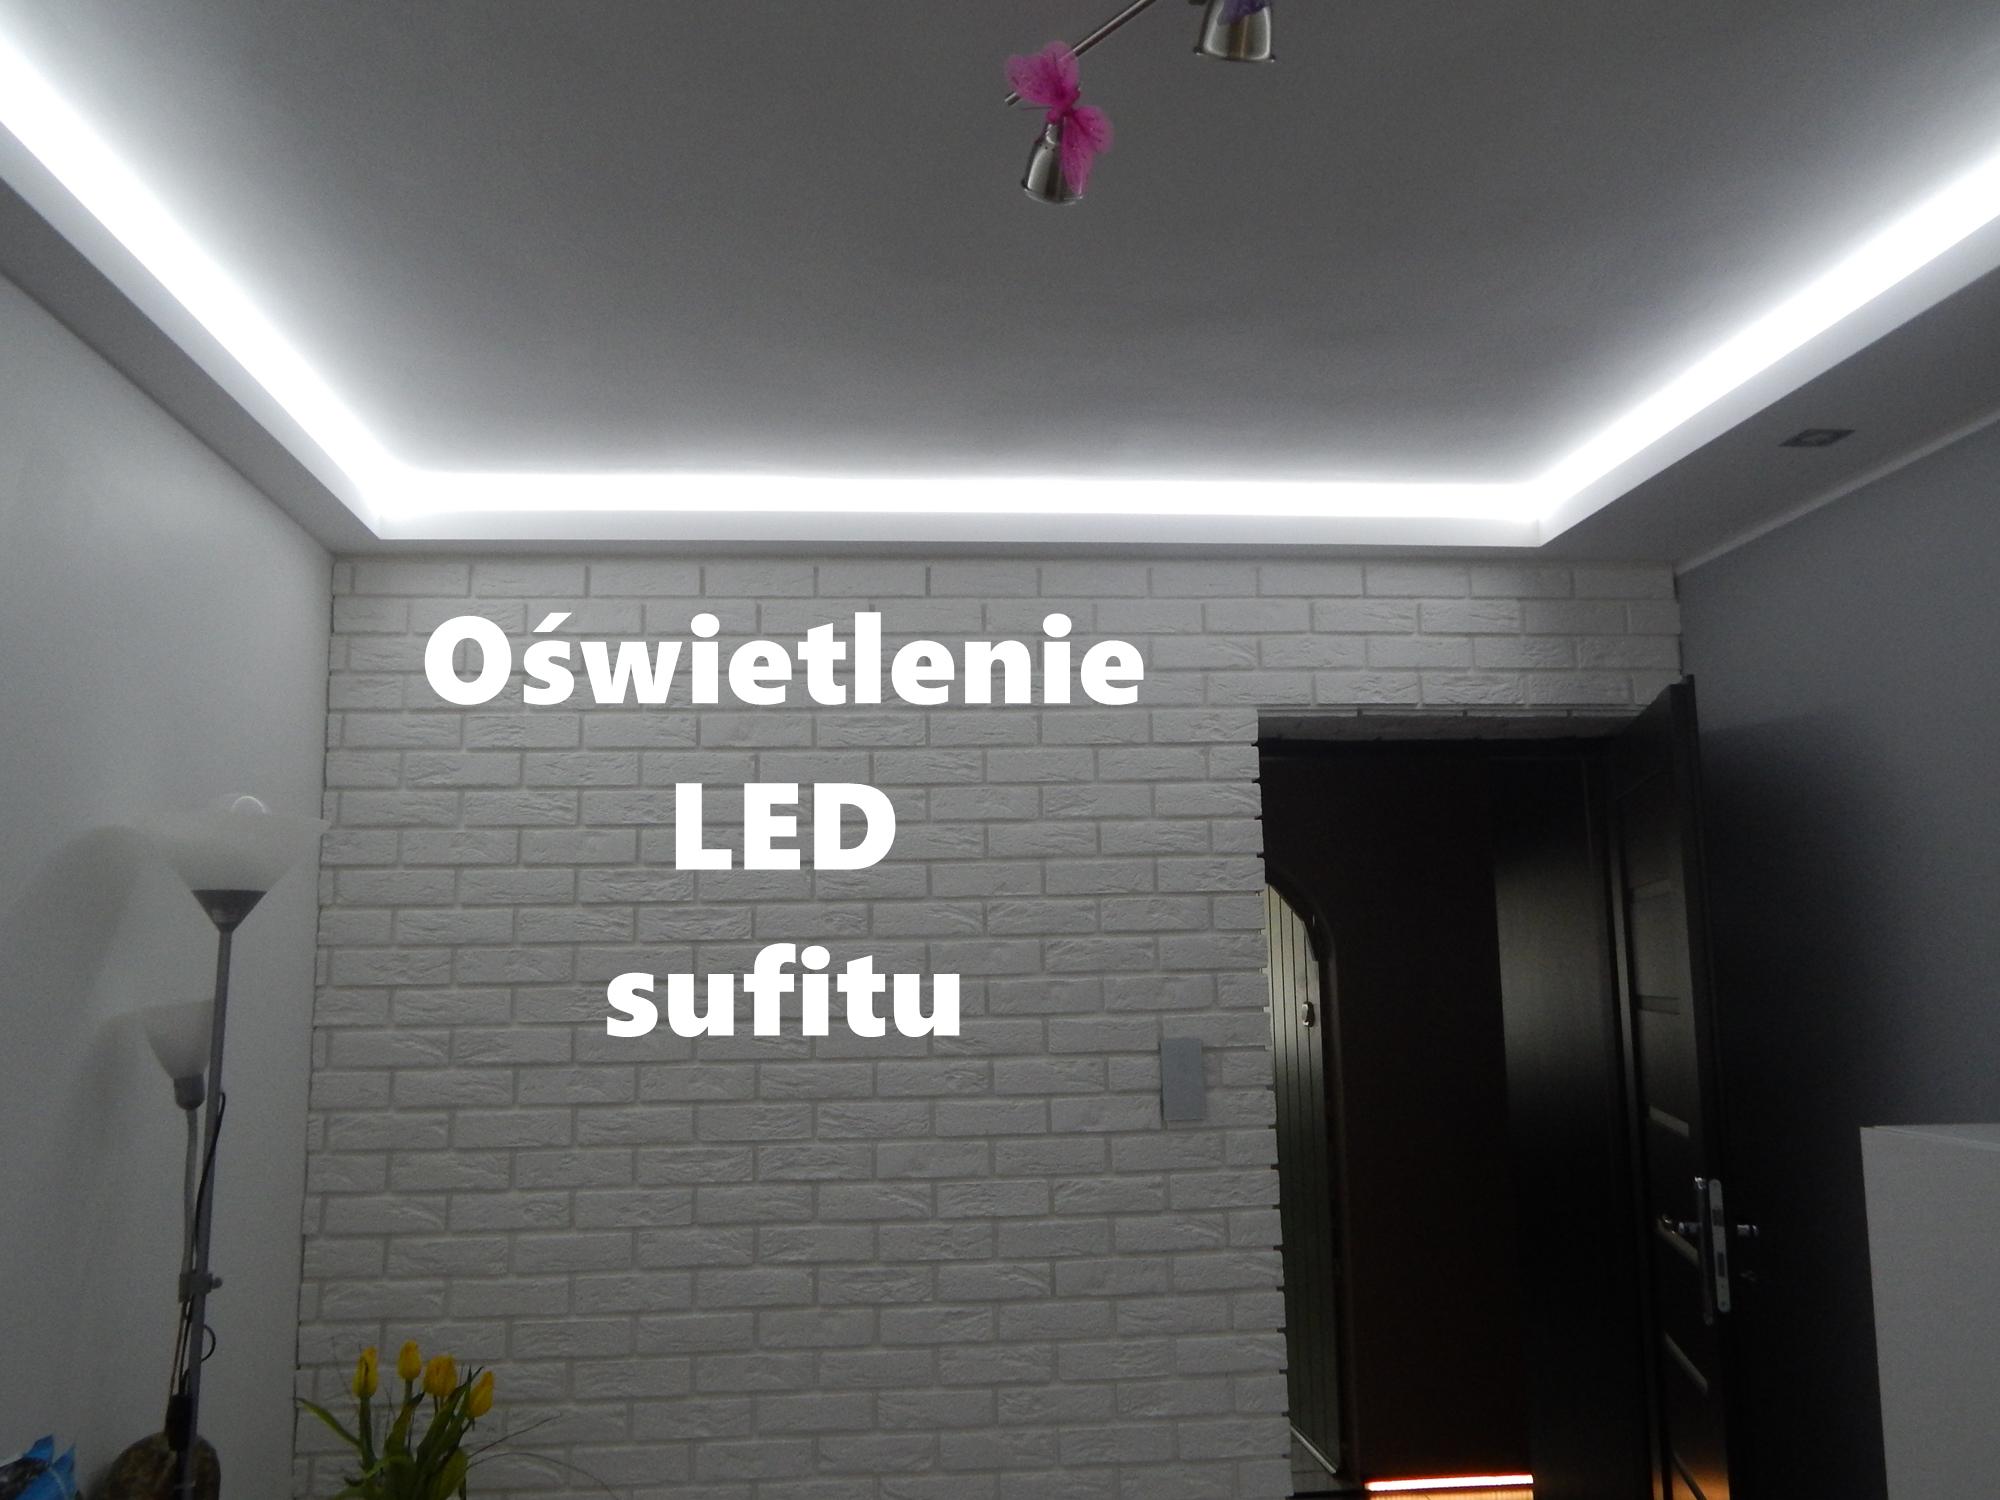 Oświetlenie Led Sufitu Blog Soledpl